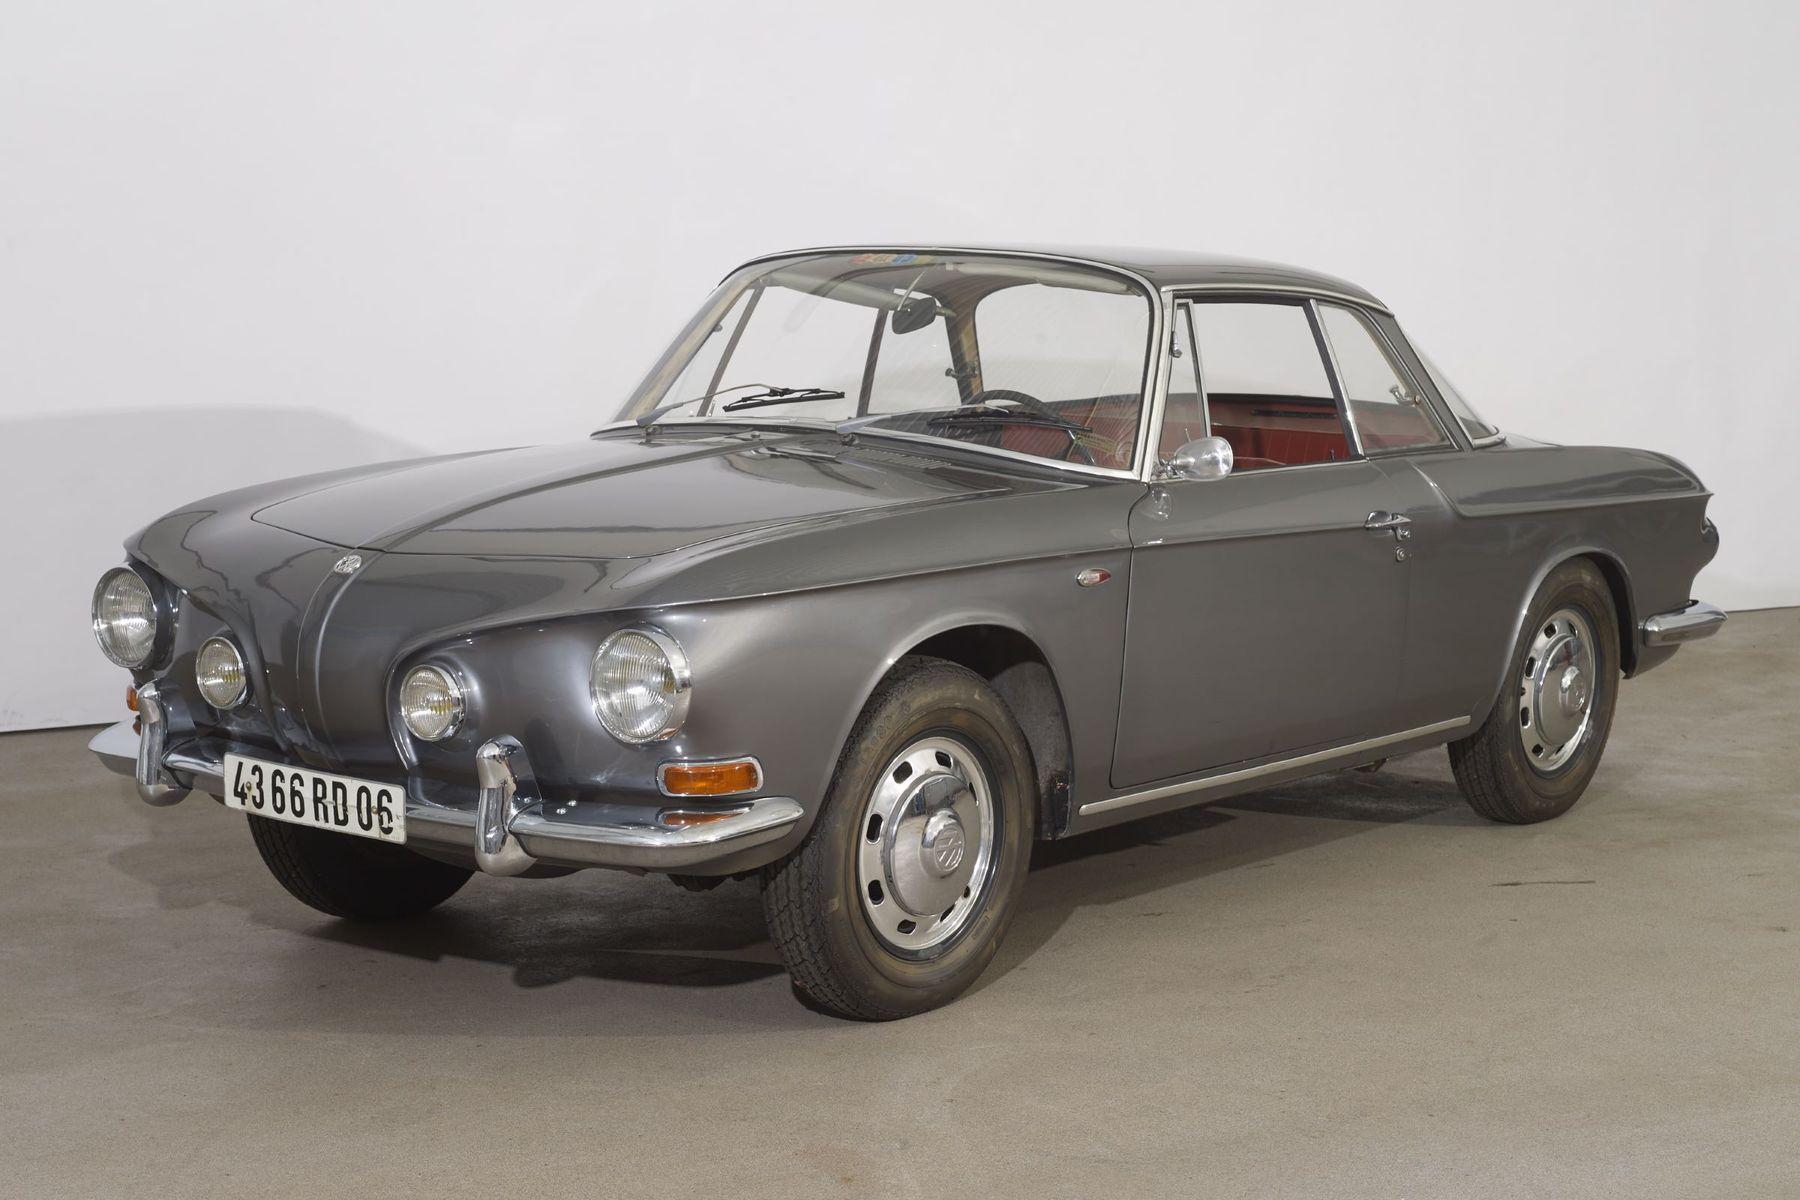 volkswagen karmann ghia 1600l typ 34 1967 p bilweb. Black Bedroom Furniture Sets. Home Design Ideas